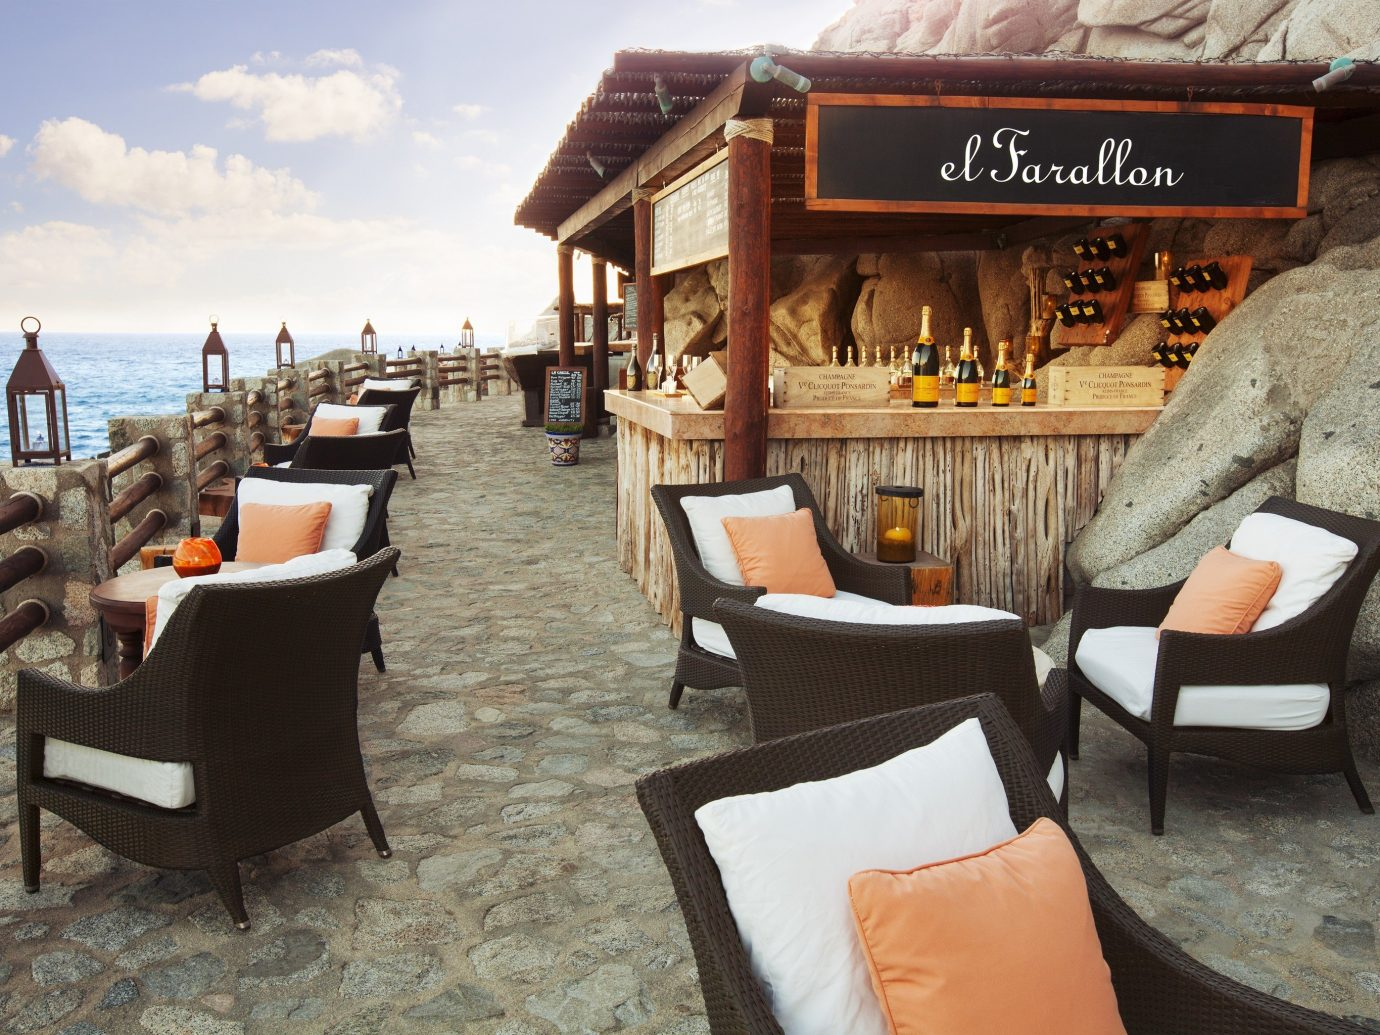 Travel Tips floor chair restaurant vacation Resort wood travel cottage furniture several